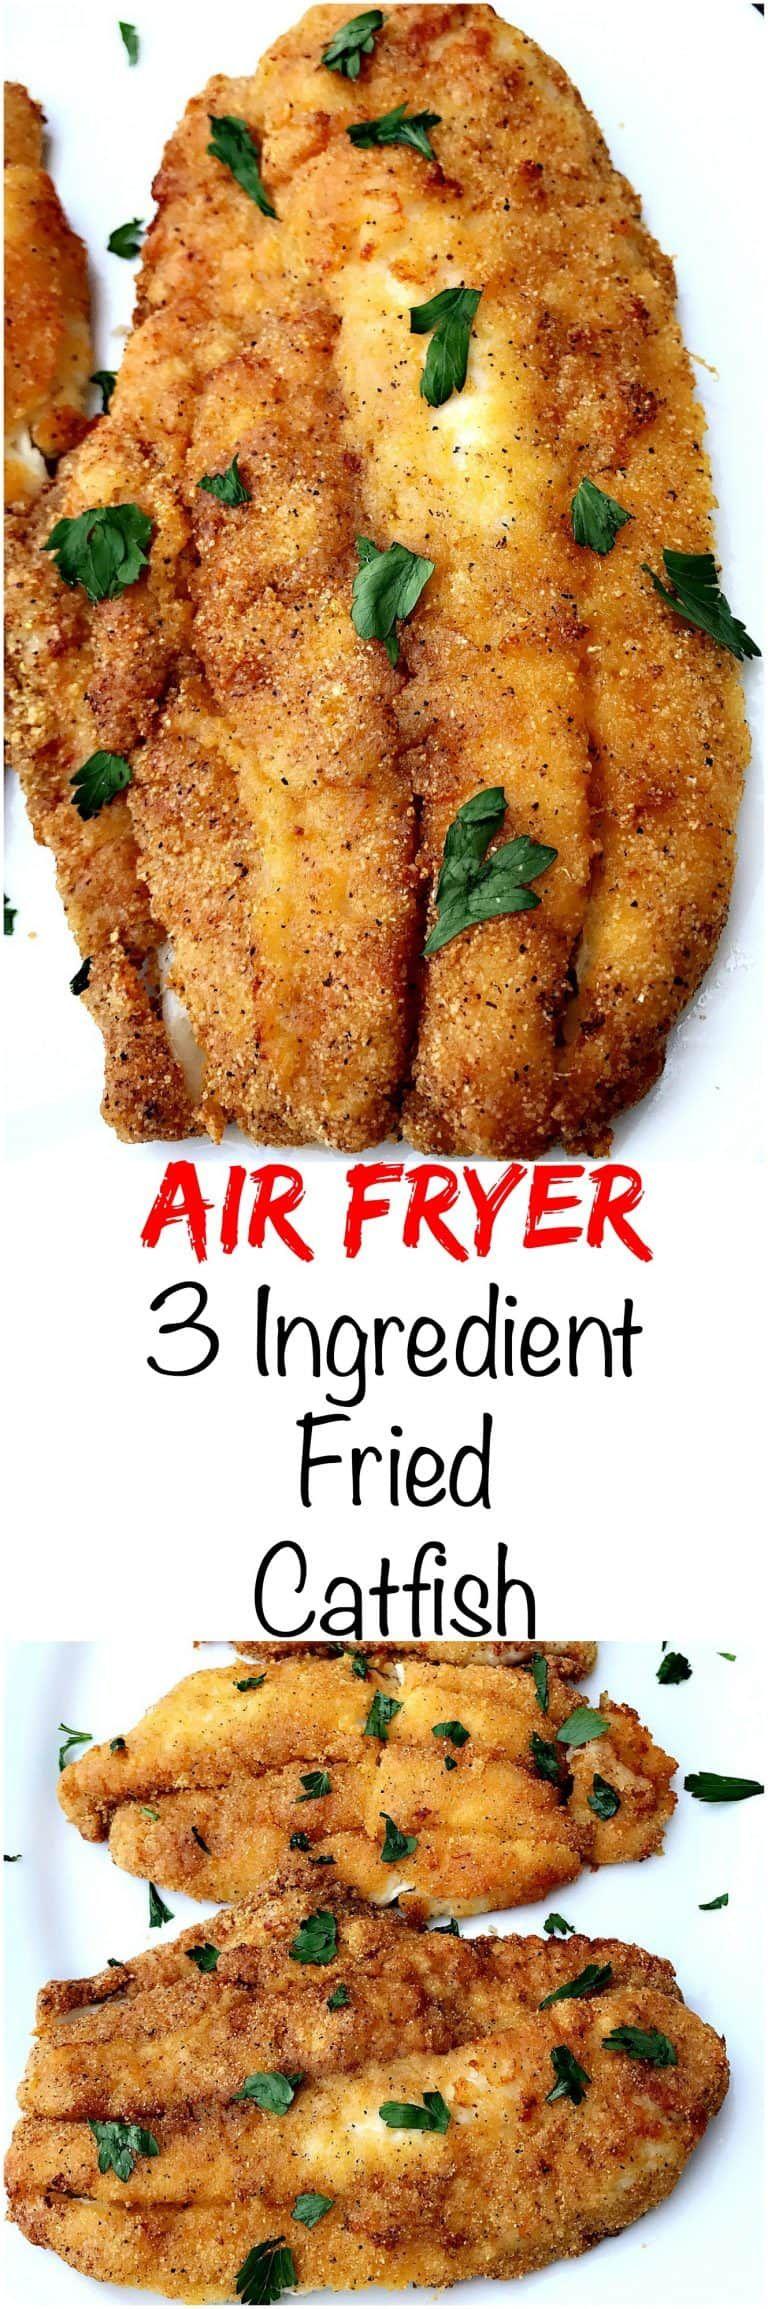 Air Fryer 3 Ingredient Fried Catfish Recipe Air Frier Recipes Air Fryer Recipes Air Fryer